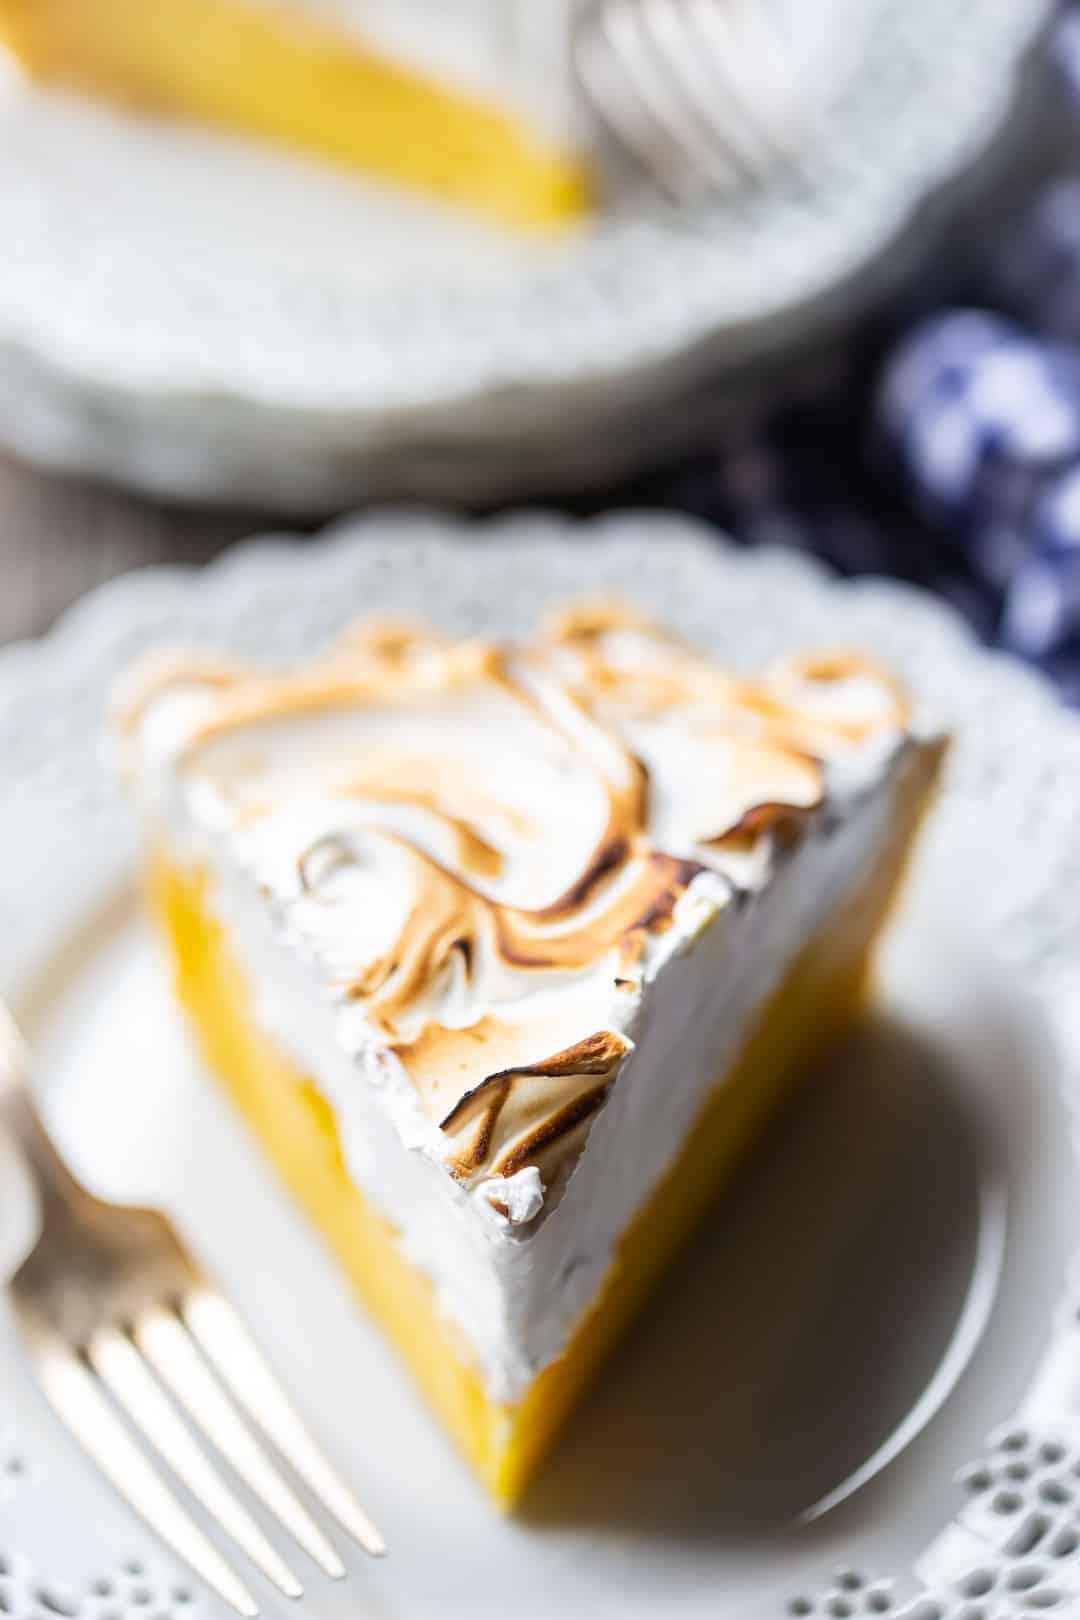 Lemon meringue pie slice on a plate with a blue checked cloth.